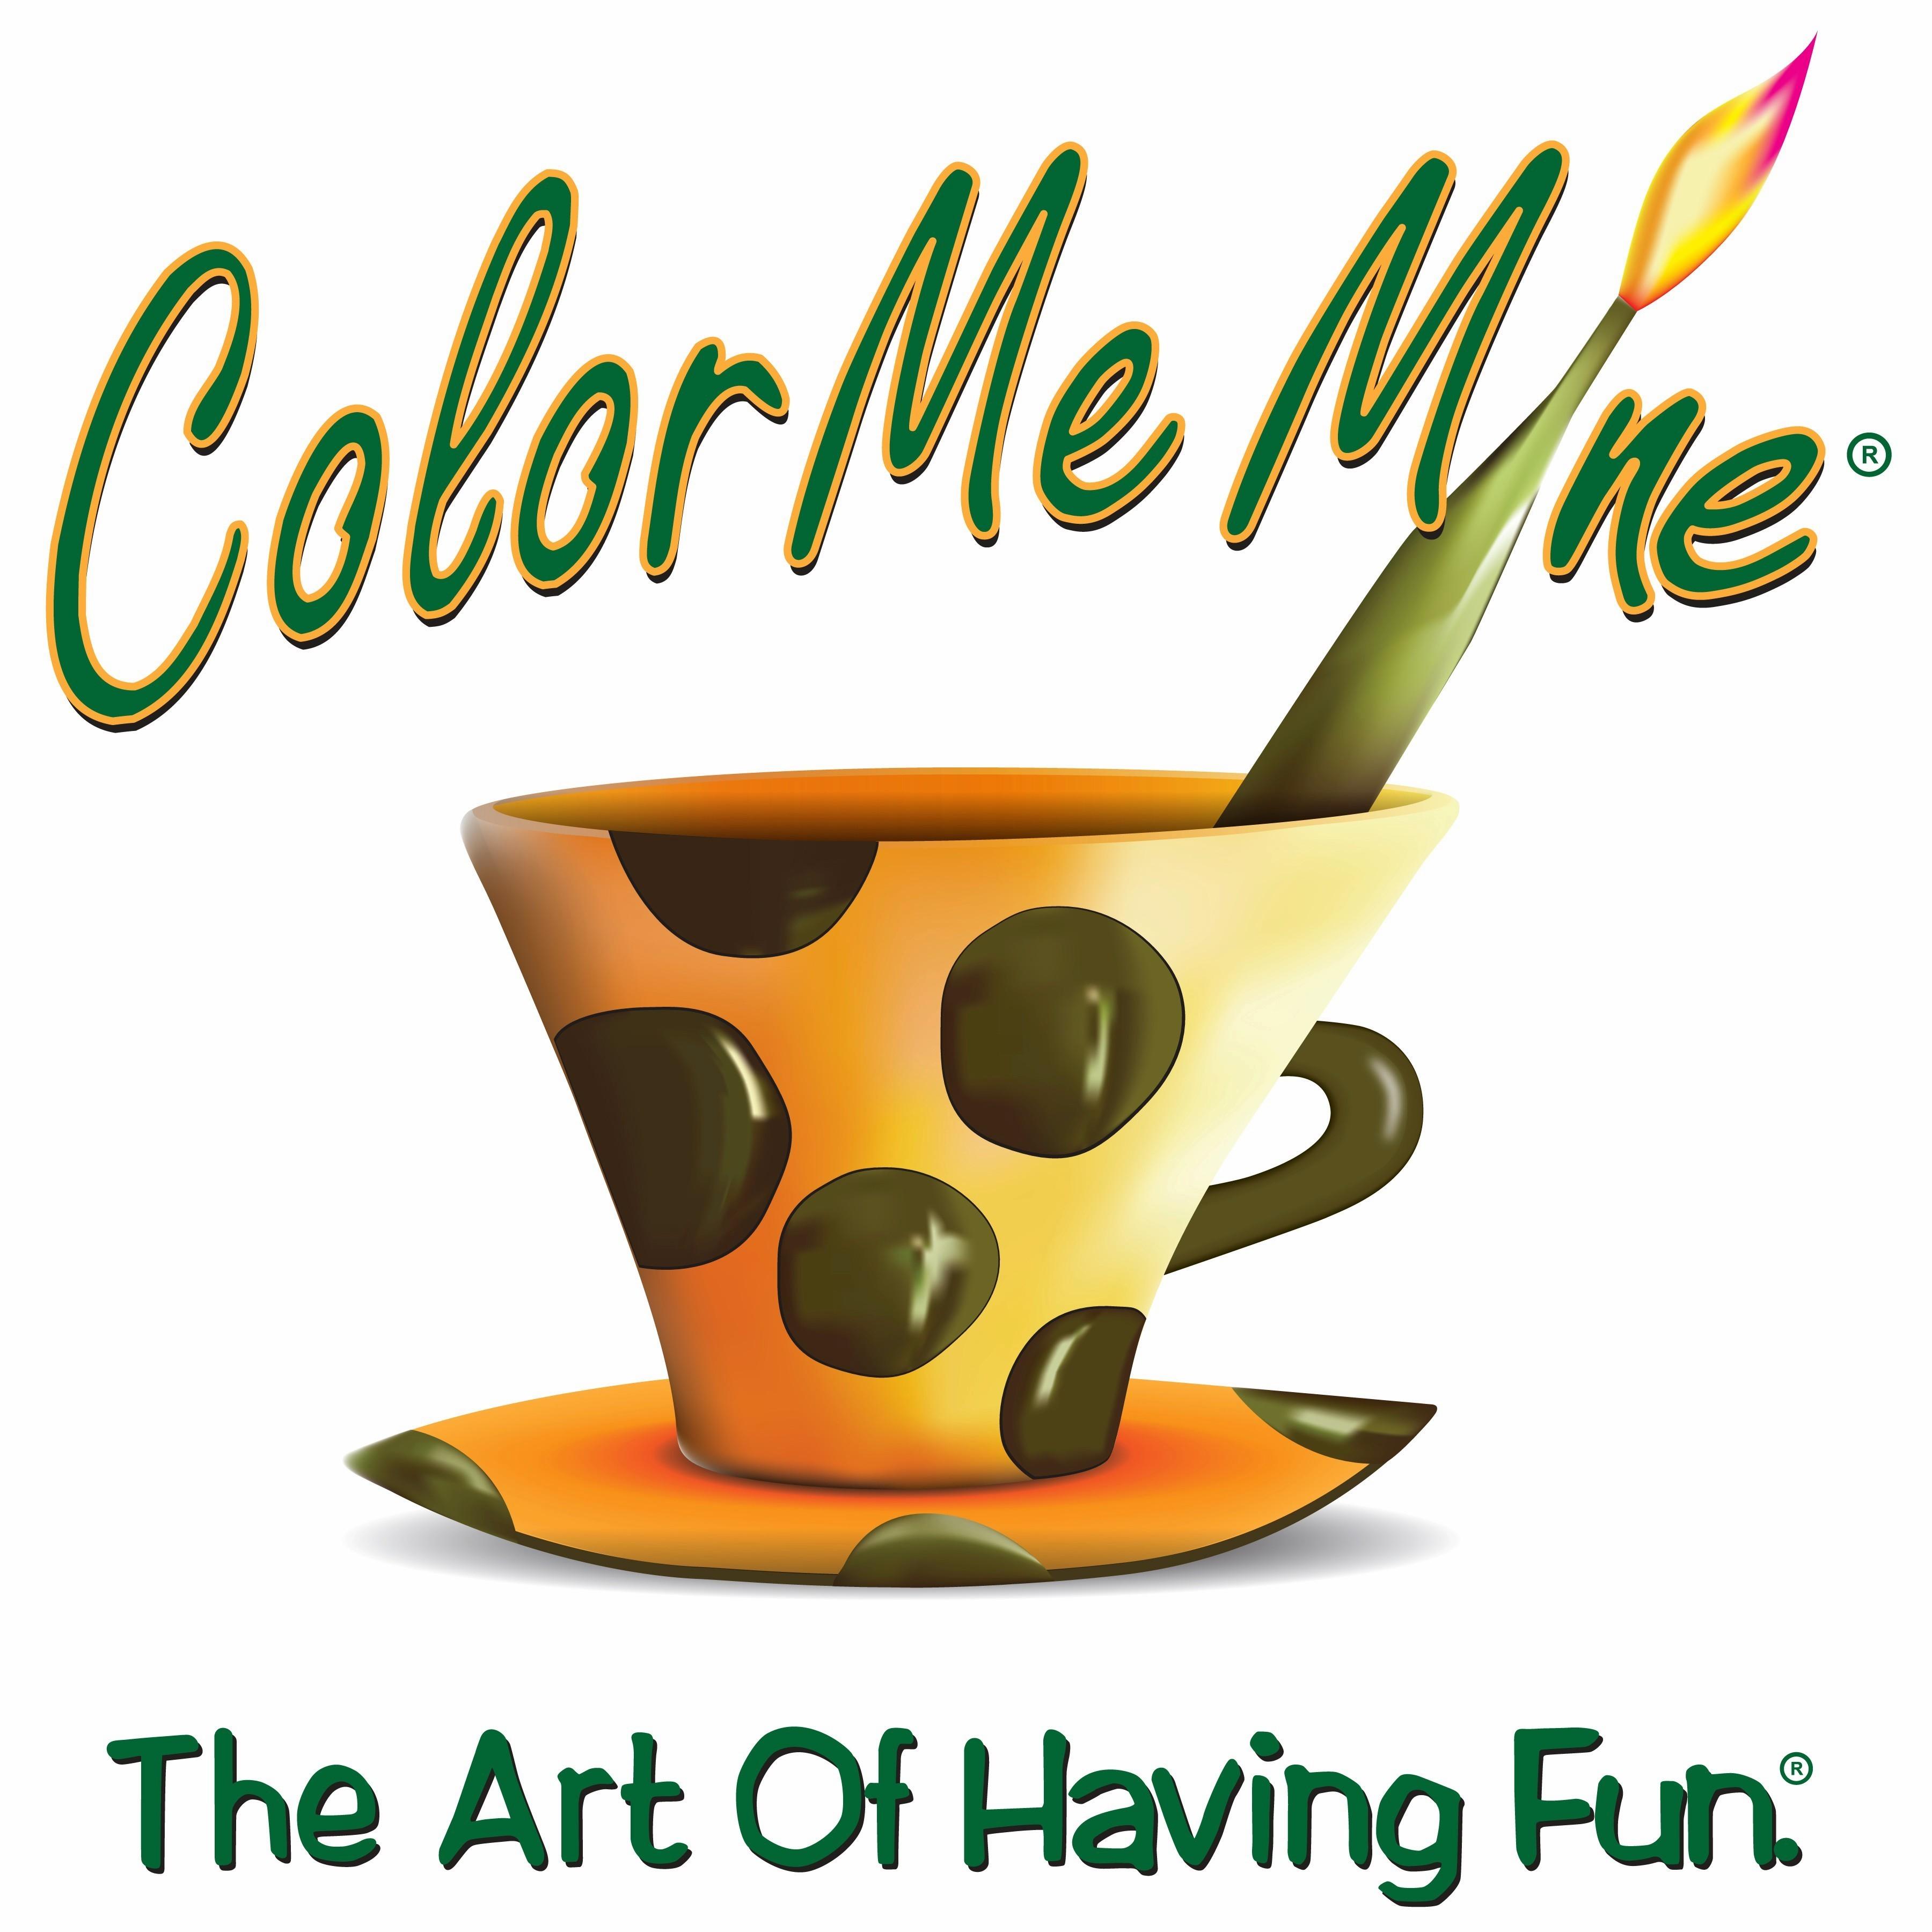 d03b90c29afb3cd6bfc1_color_me_mine_logo.jpg